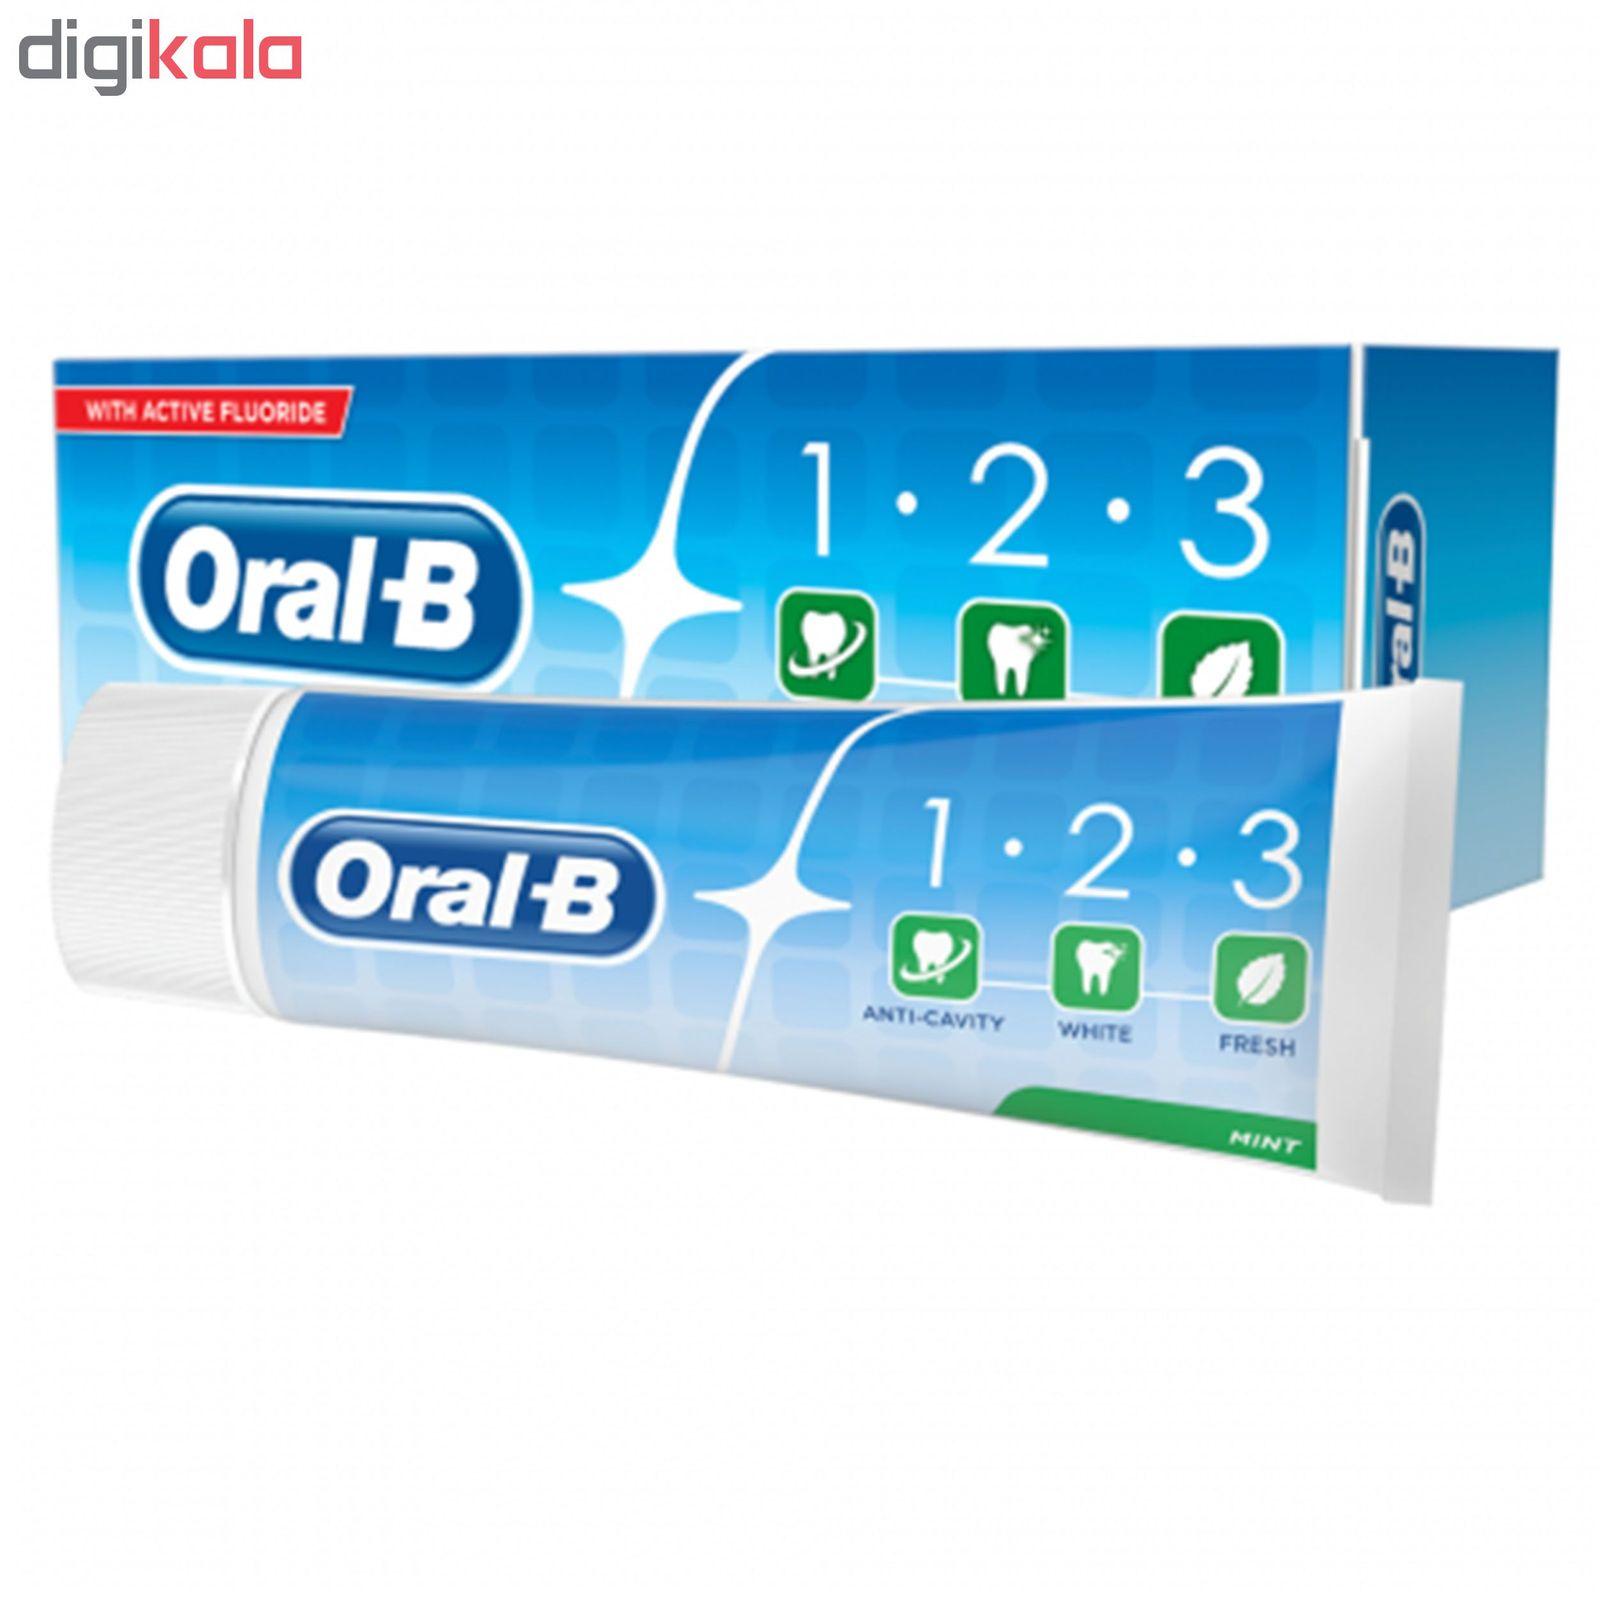 خمیر دندان اورال- بی مدل 1.2.3 حجم 100 میلی لیتر main 1 3